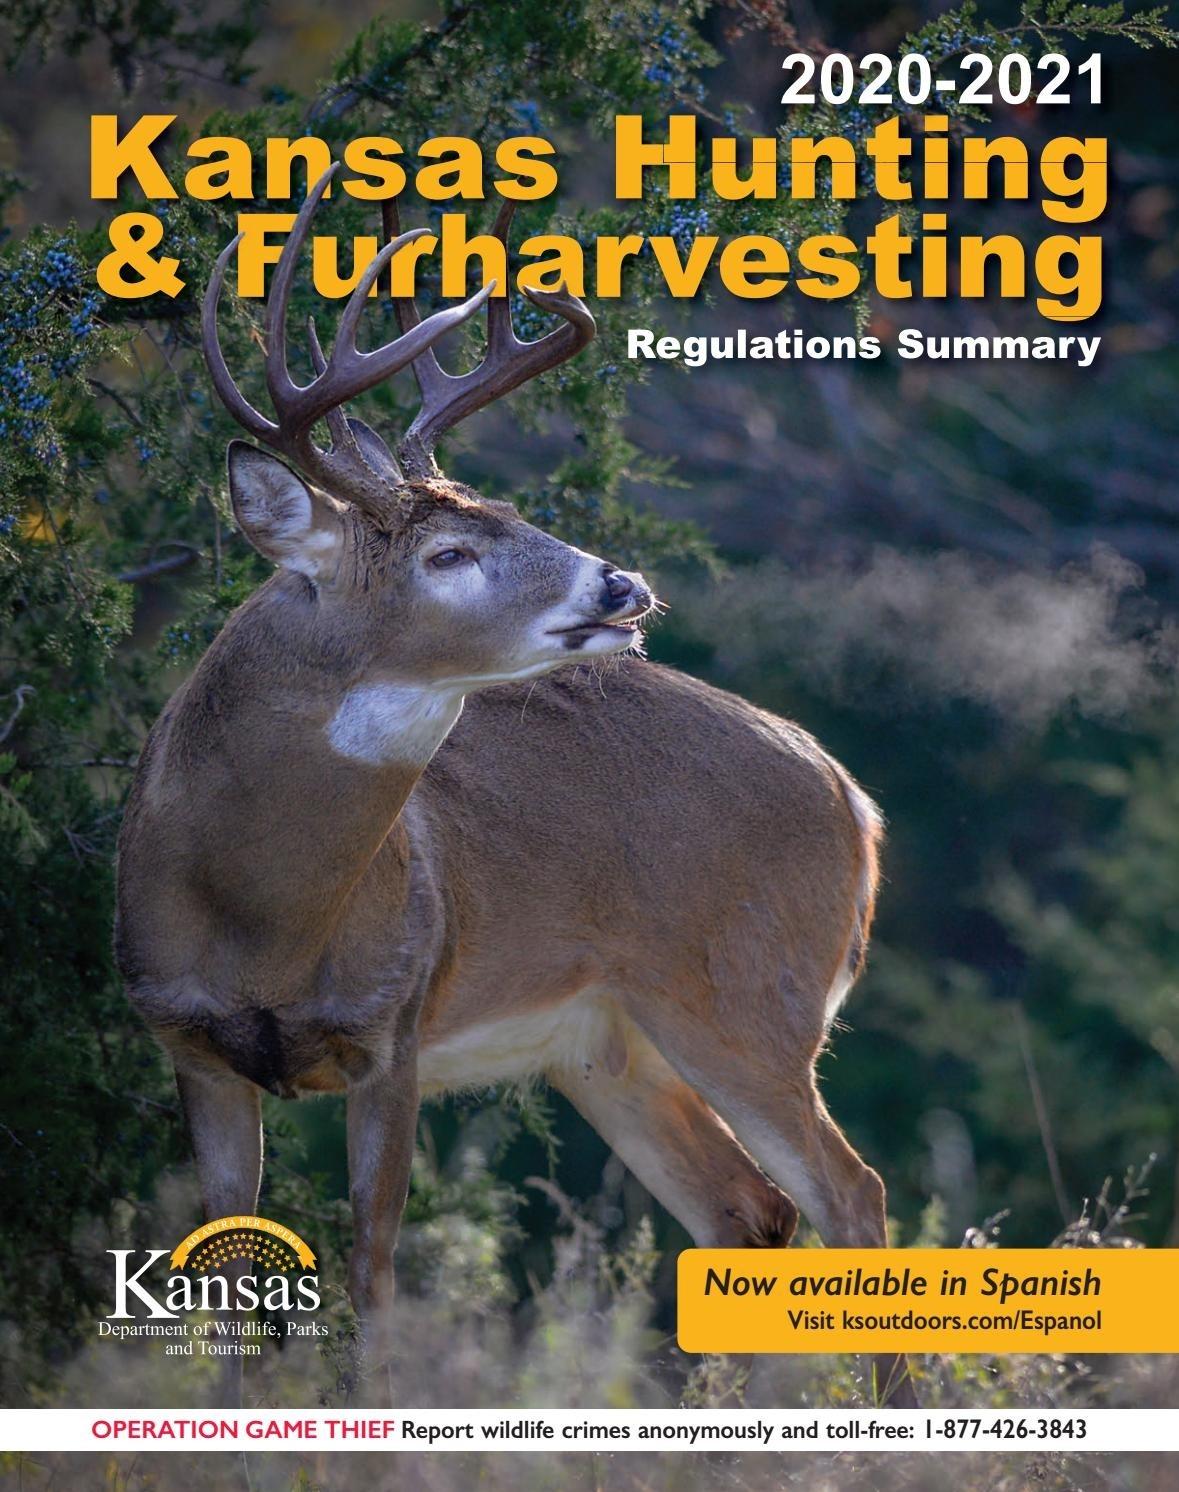 2020-2021 Kansas Hunting & Furharvesting Regulations Summary  Kansas Whitetail 2021 Rut